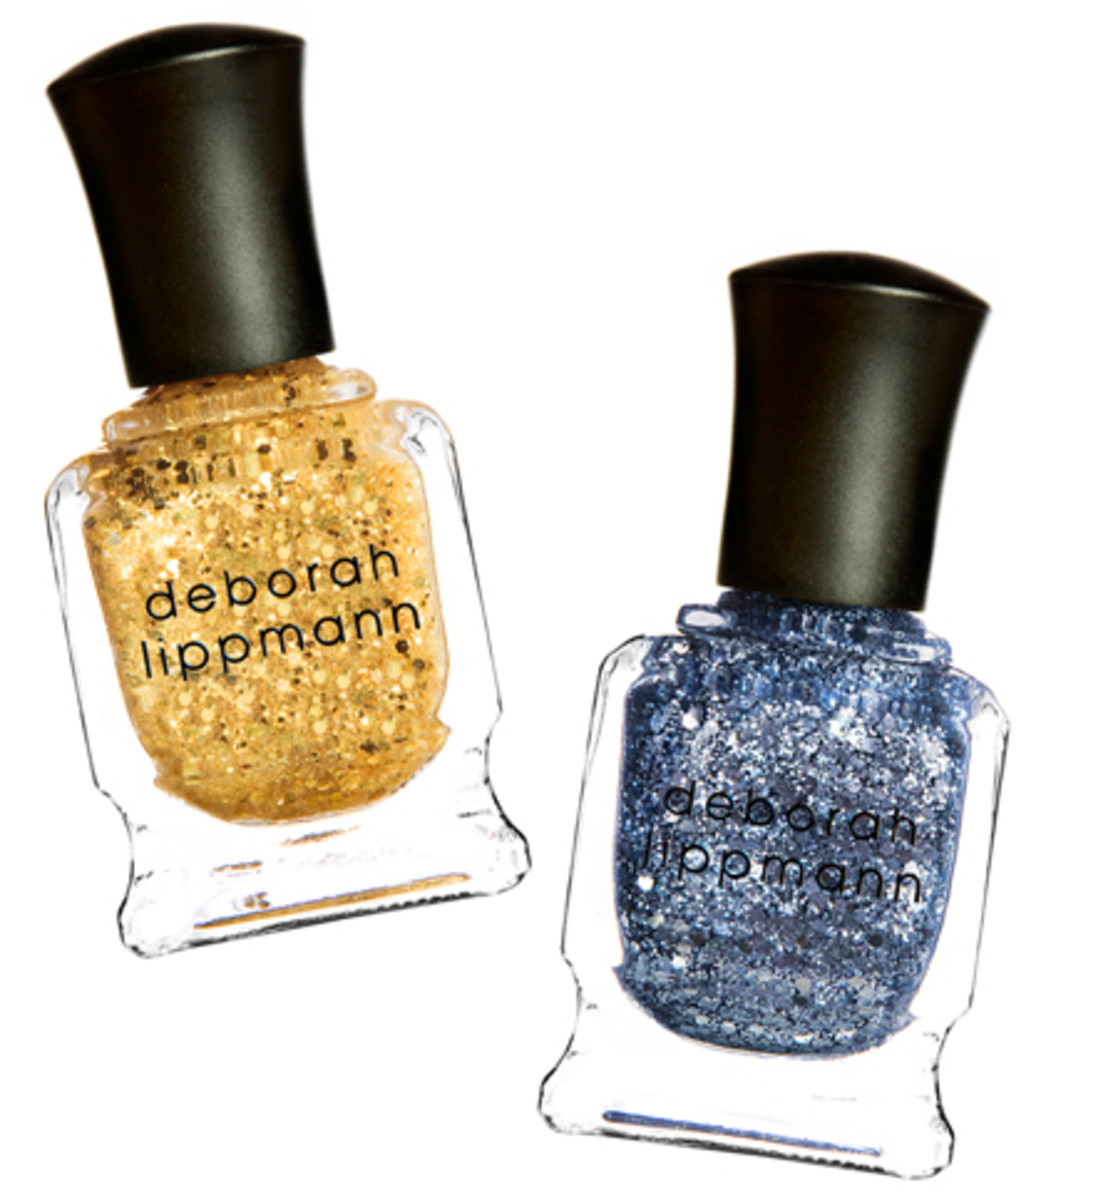 Deborah Lippmann nail polish in Boom Boom Pow and Today Was A Fairytale